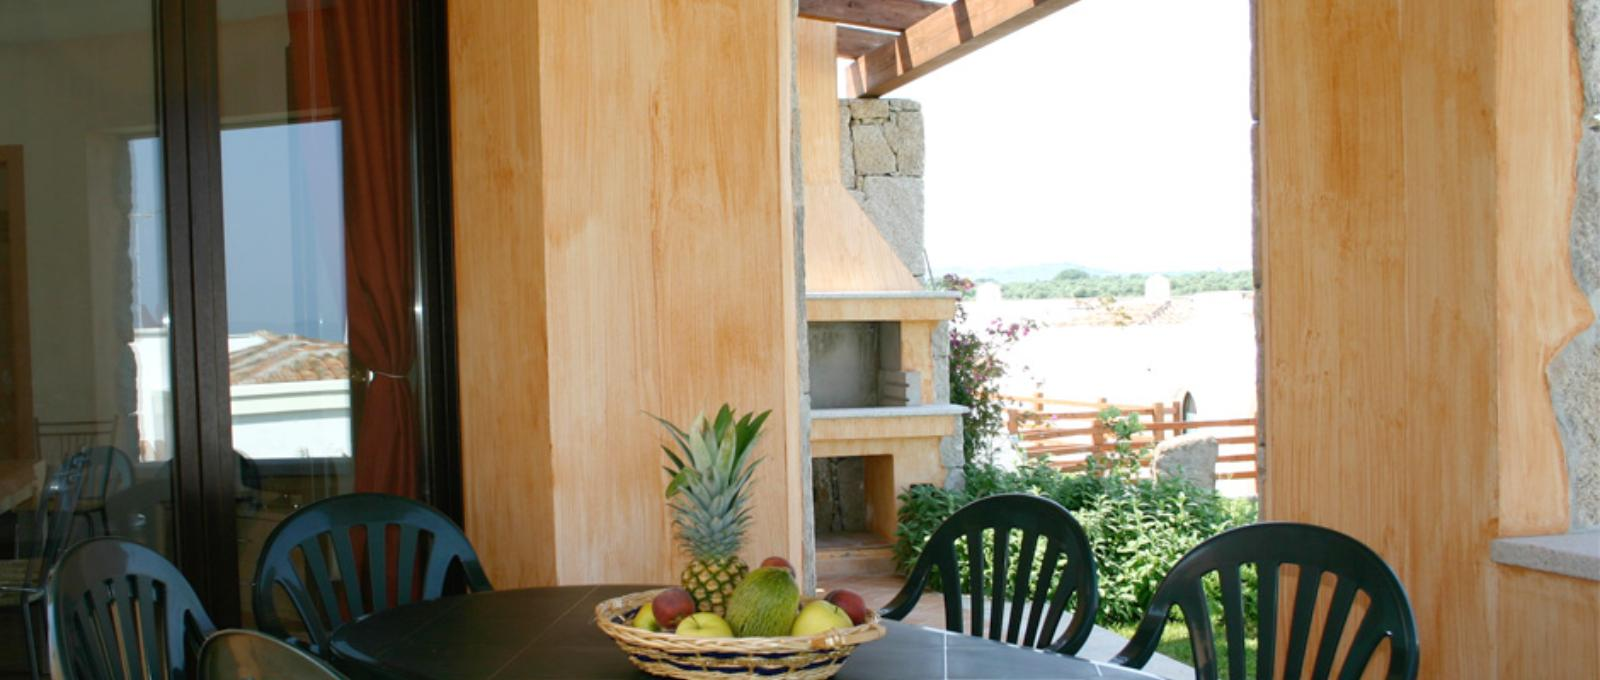 Panorama residenz Alghero, Villa 4 personen